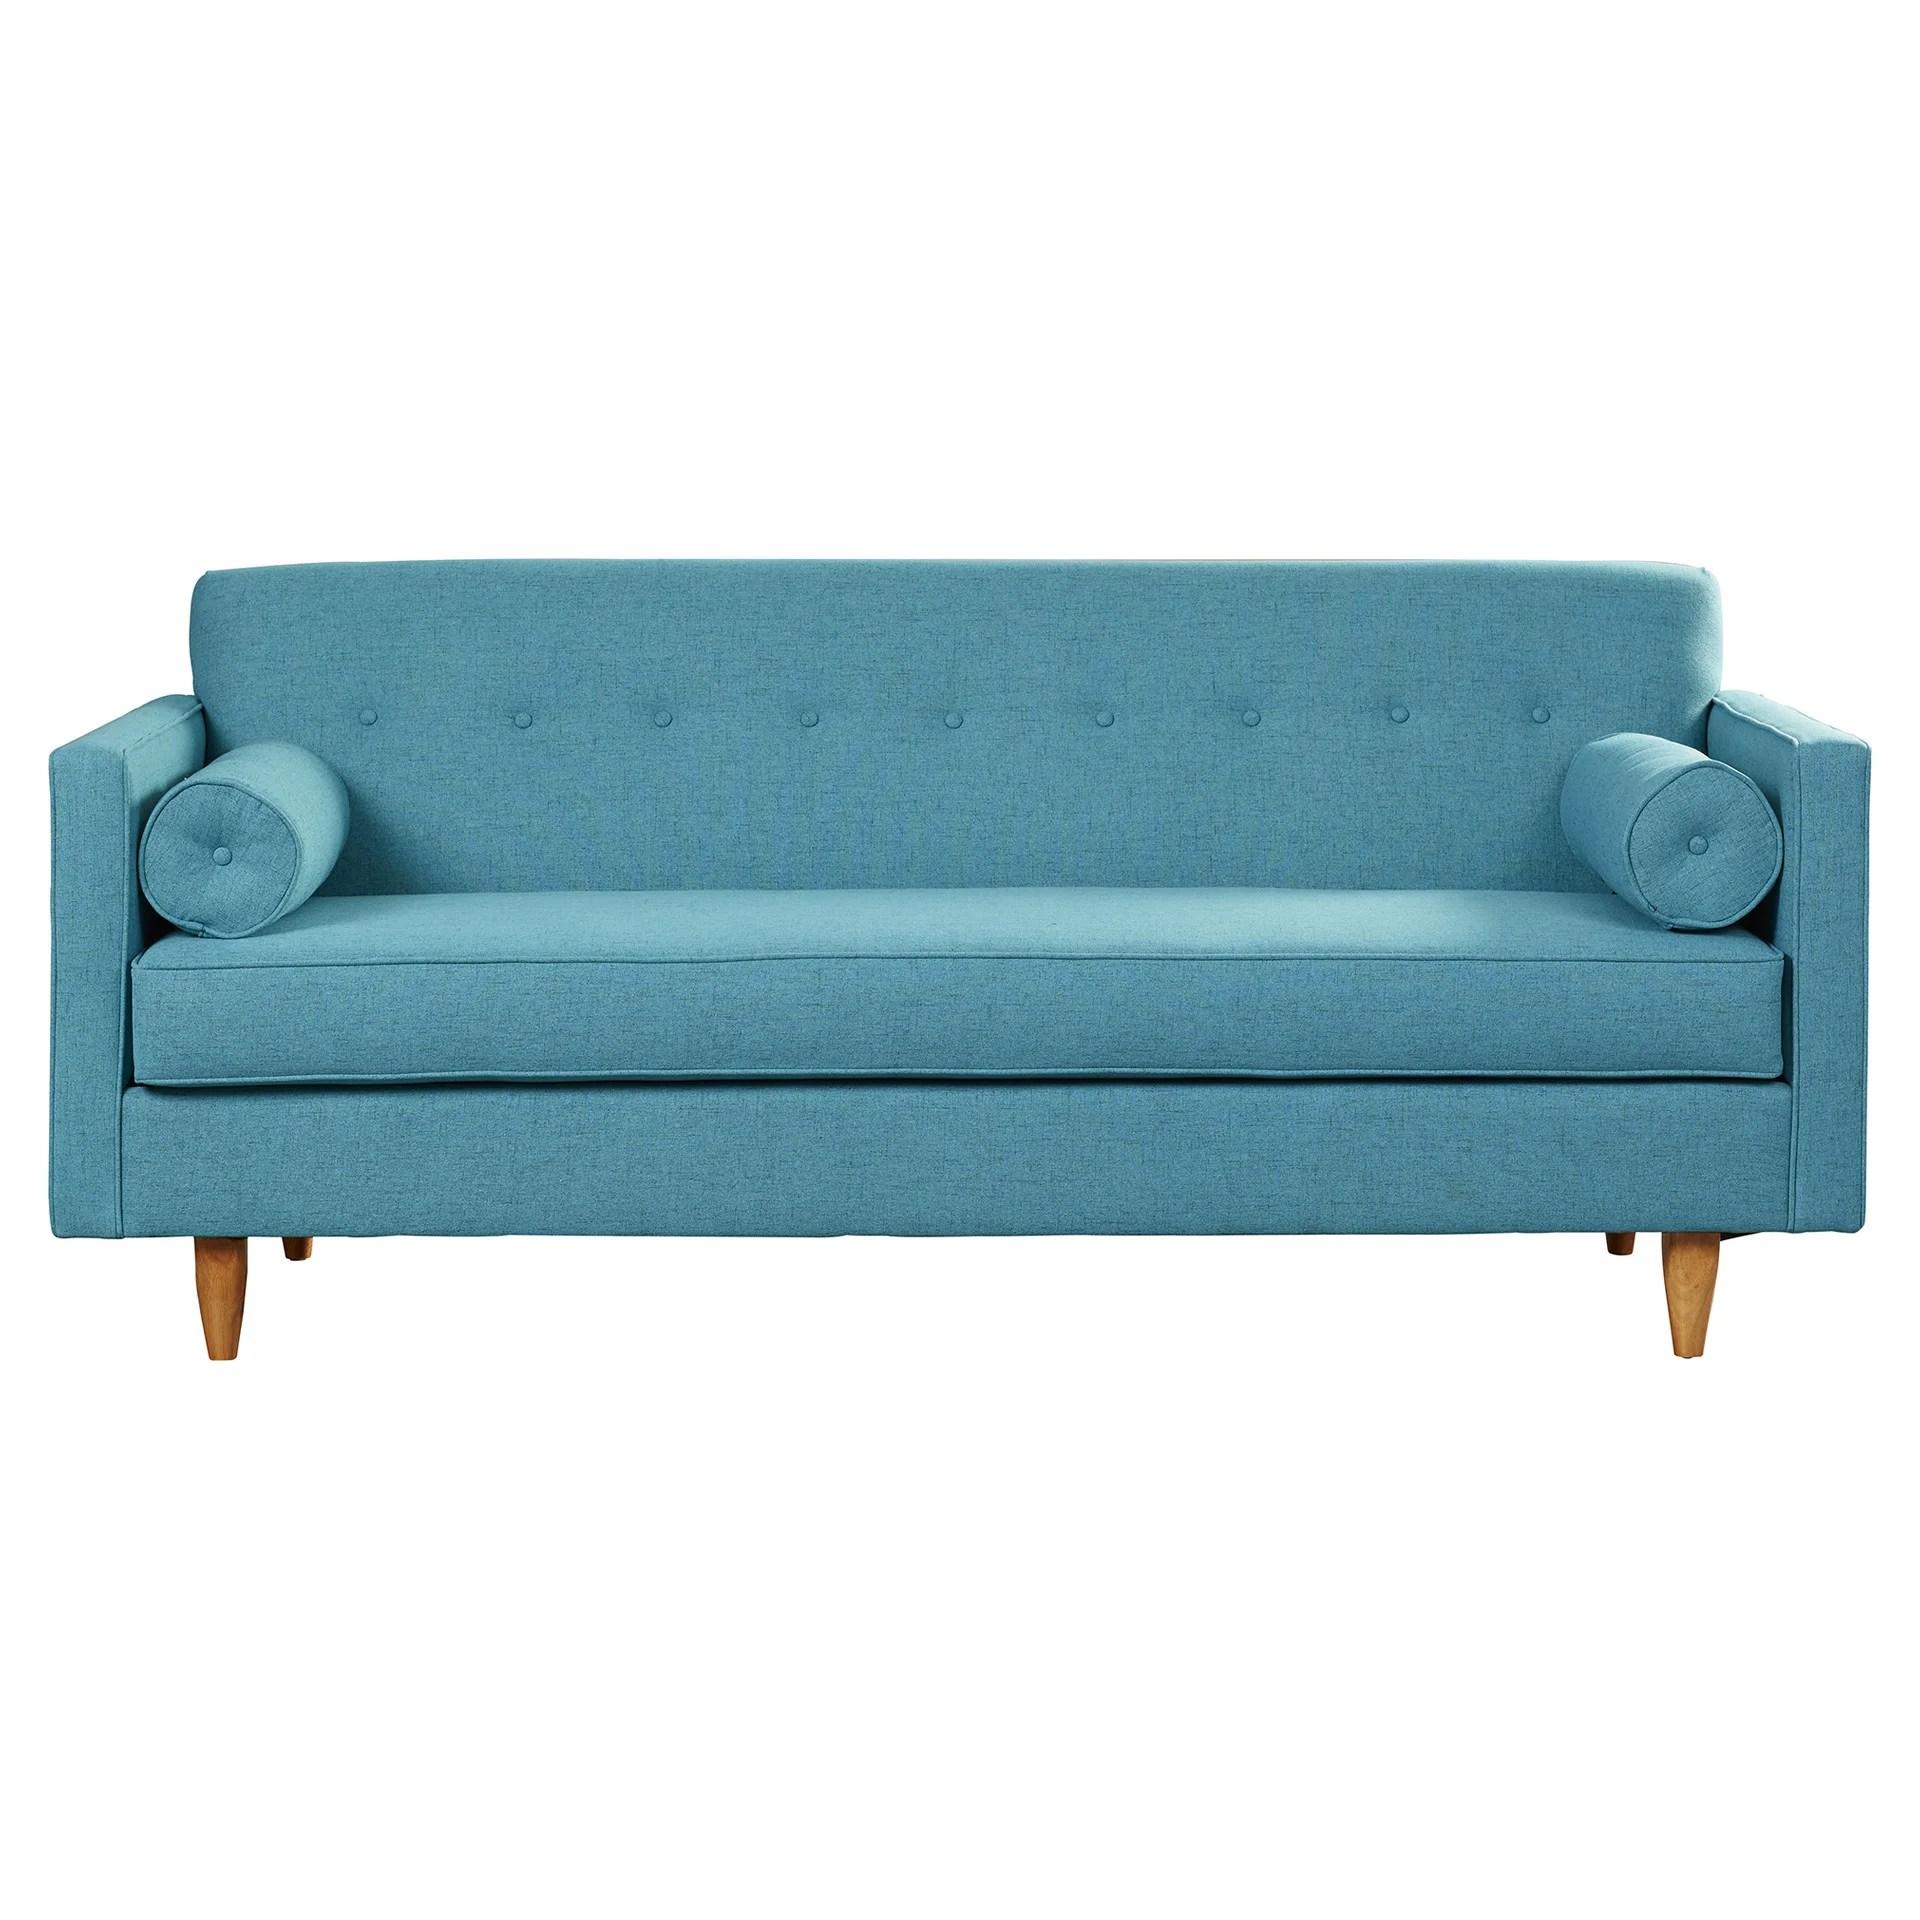 button tufted sofas sofa corner leather corrigan studio antioch wayfair